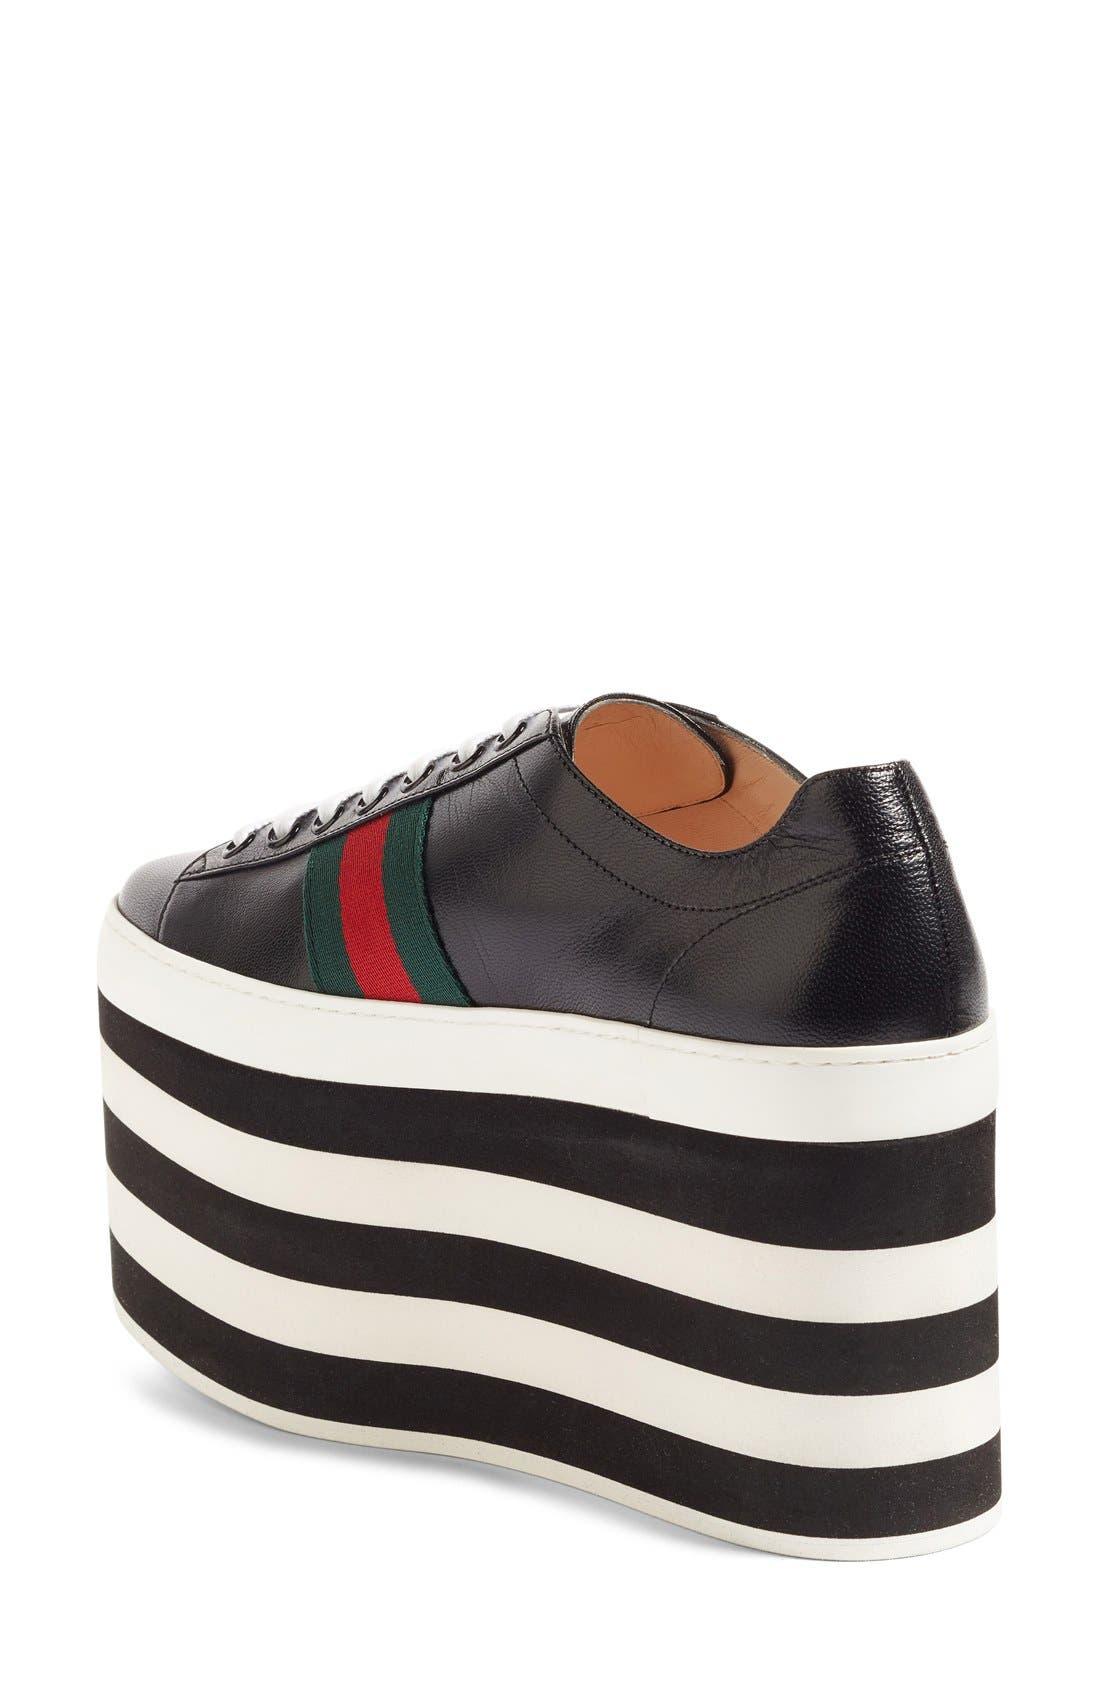 Alternate Image 2  - Gucci Peggy Platform Sneaker (Women)